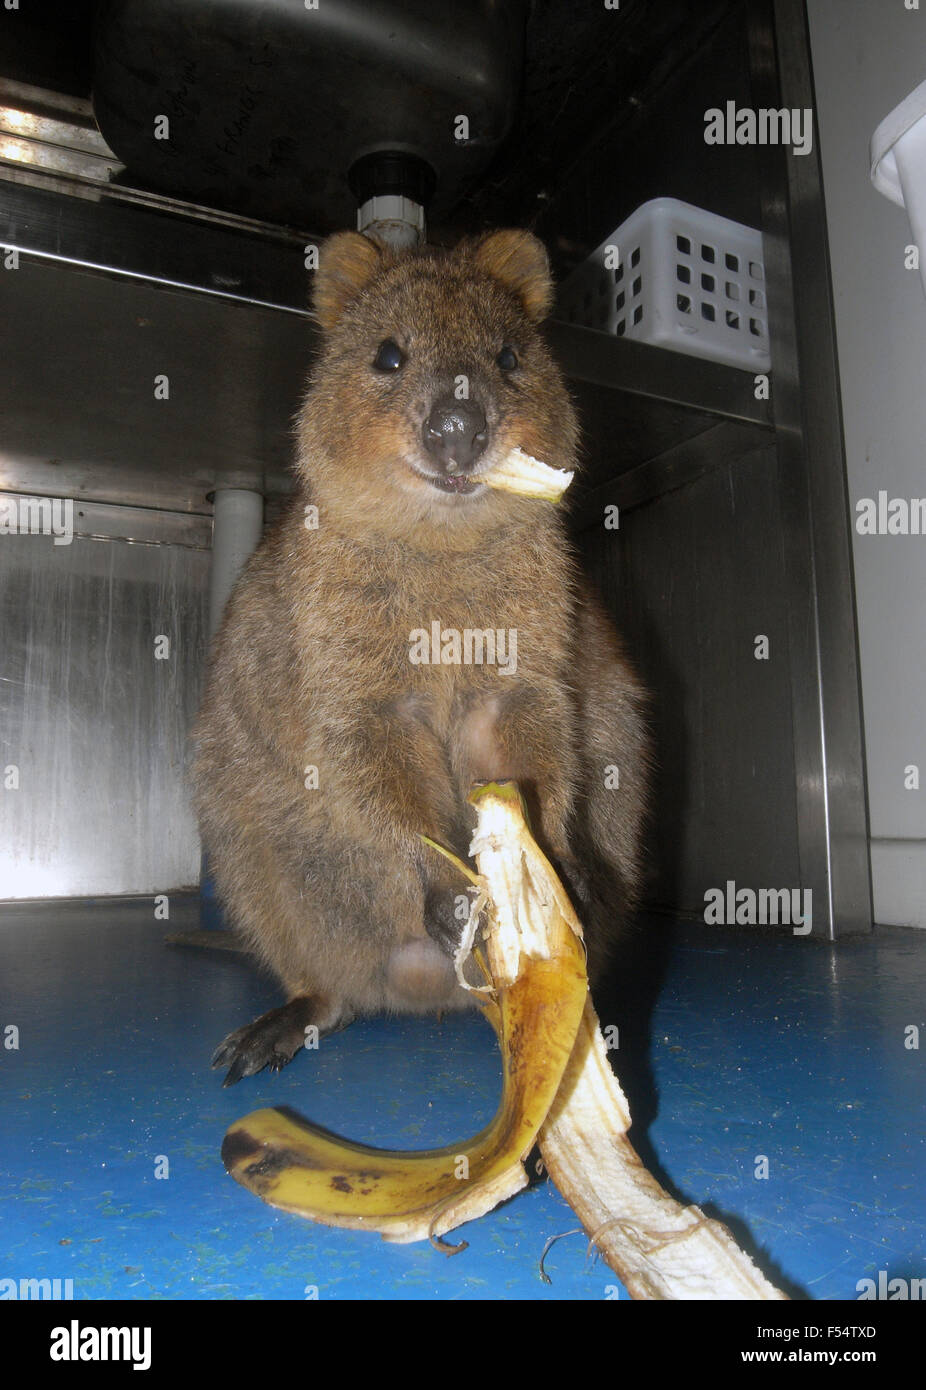 Quokka (Setonix brachyurus) eating a banana peel that it has stolen from the bin in accommodation hut, RottnestStock Photo